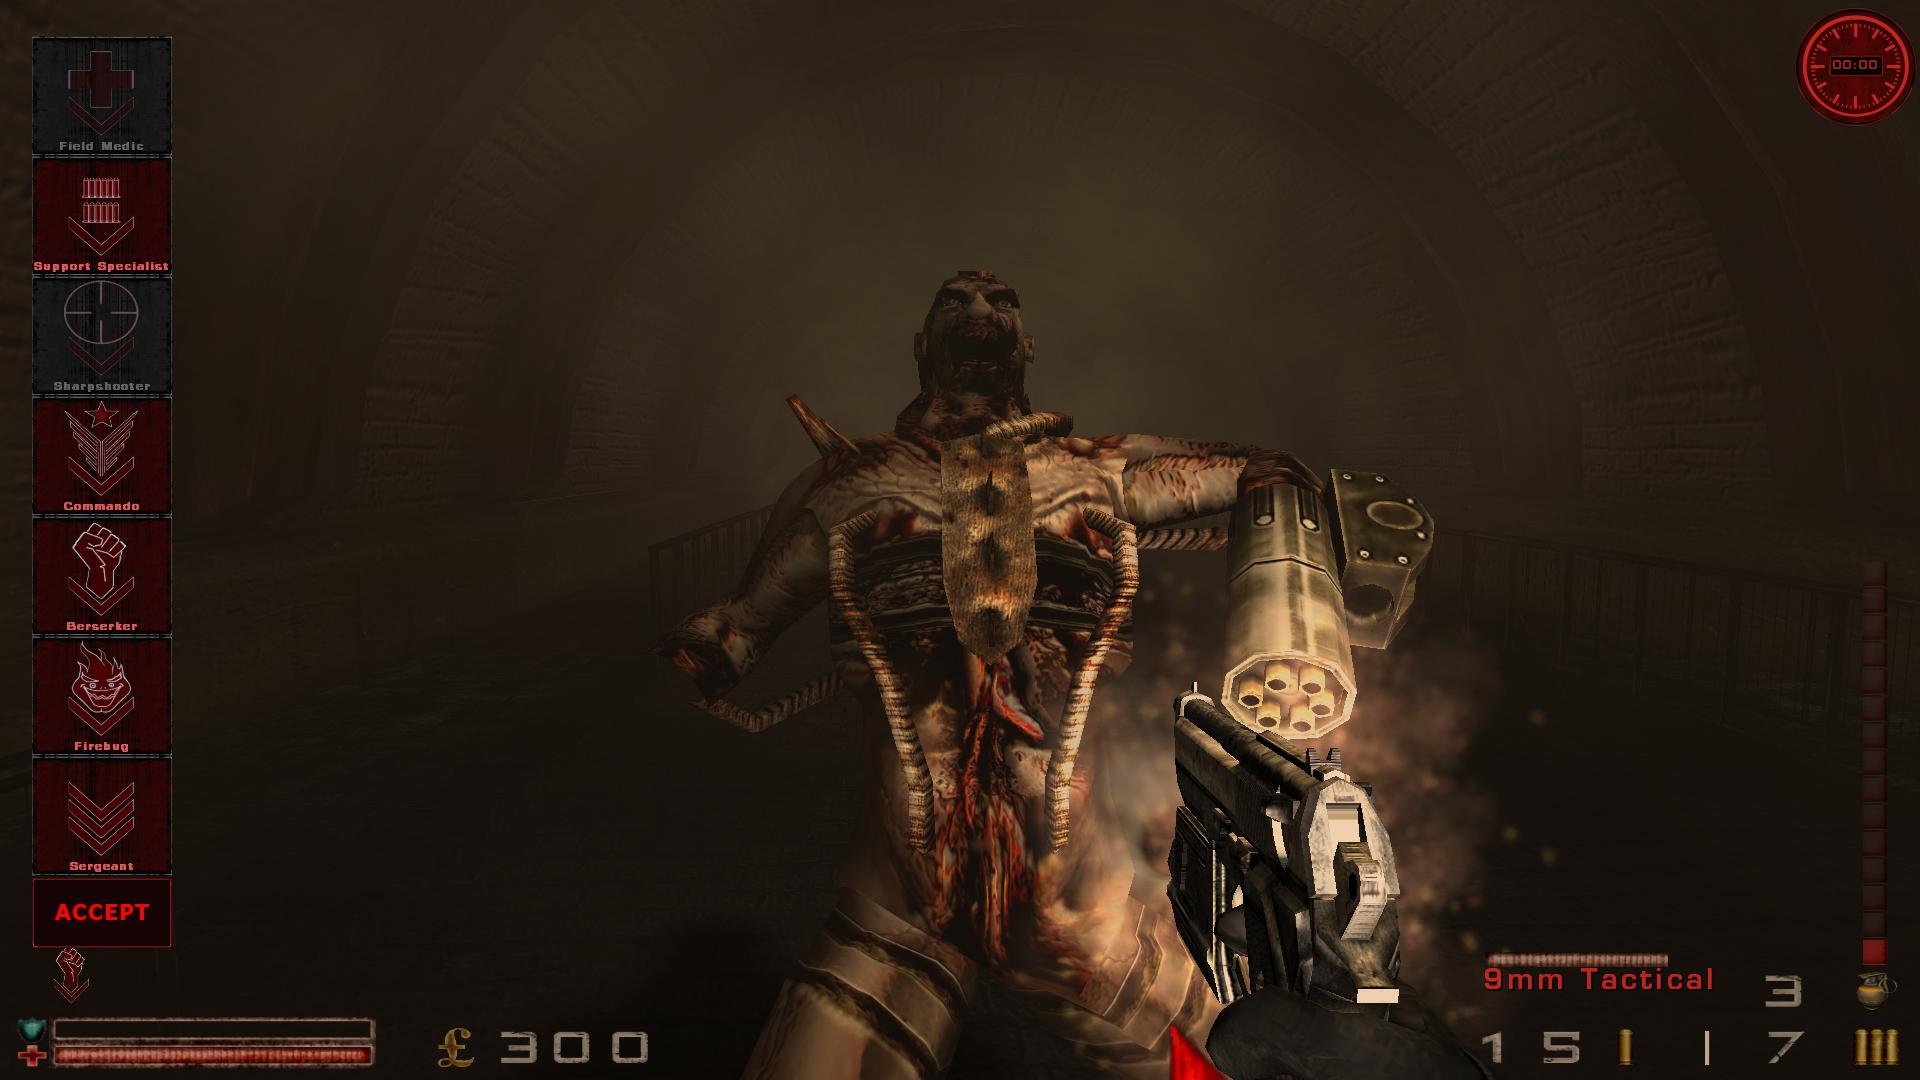 CLOT 2.0 image - Killing Floor mod for Unreal Tournament